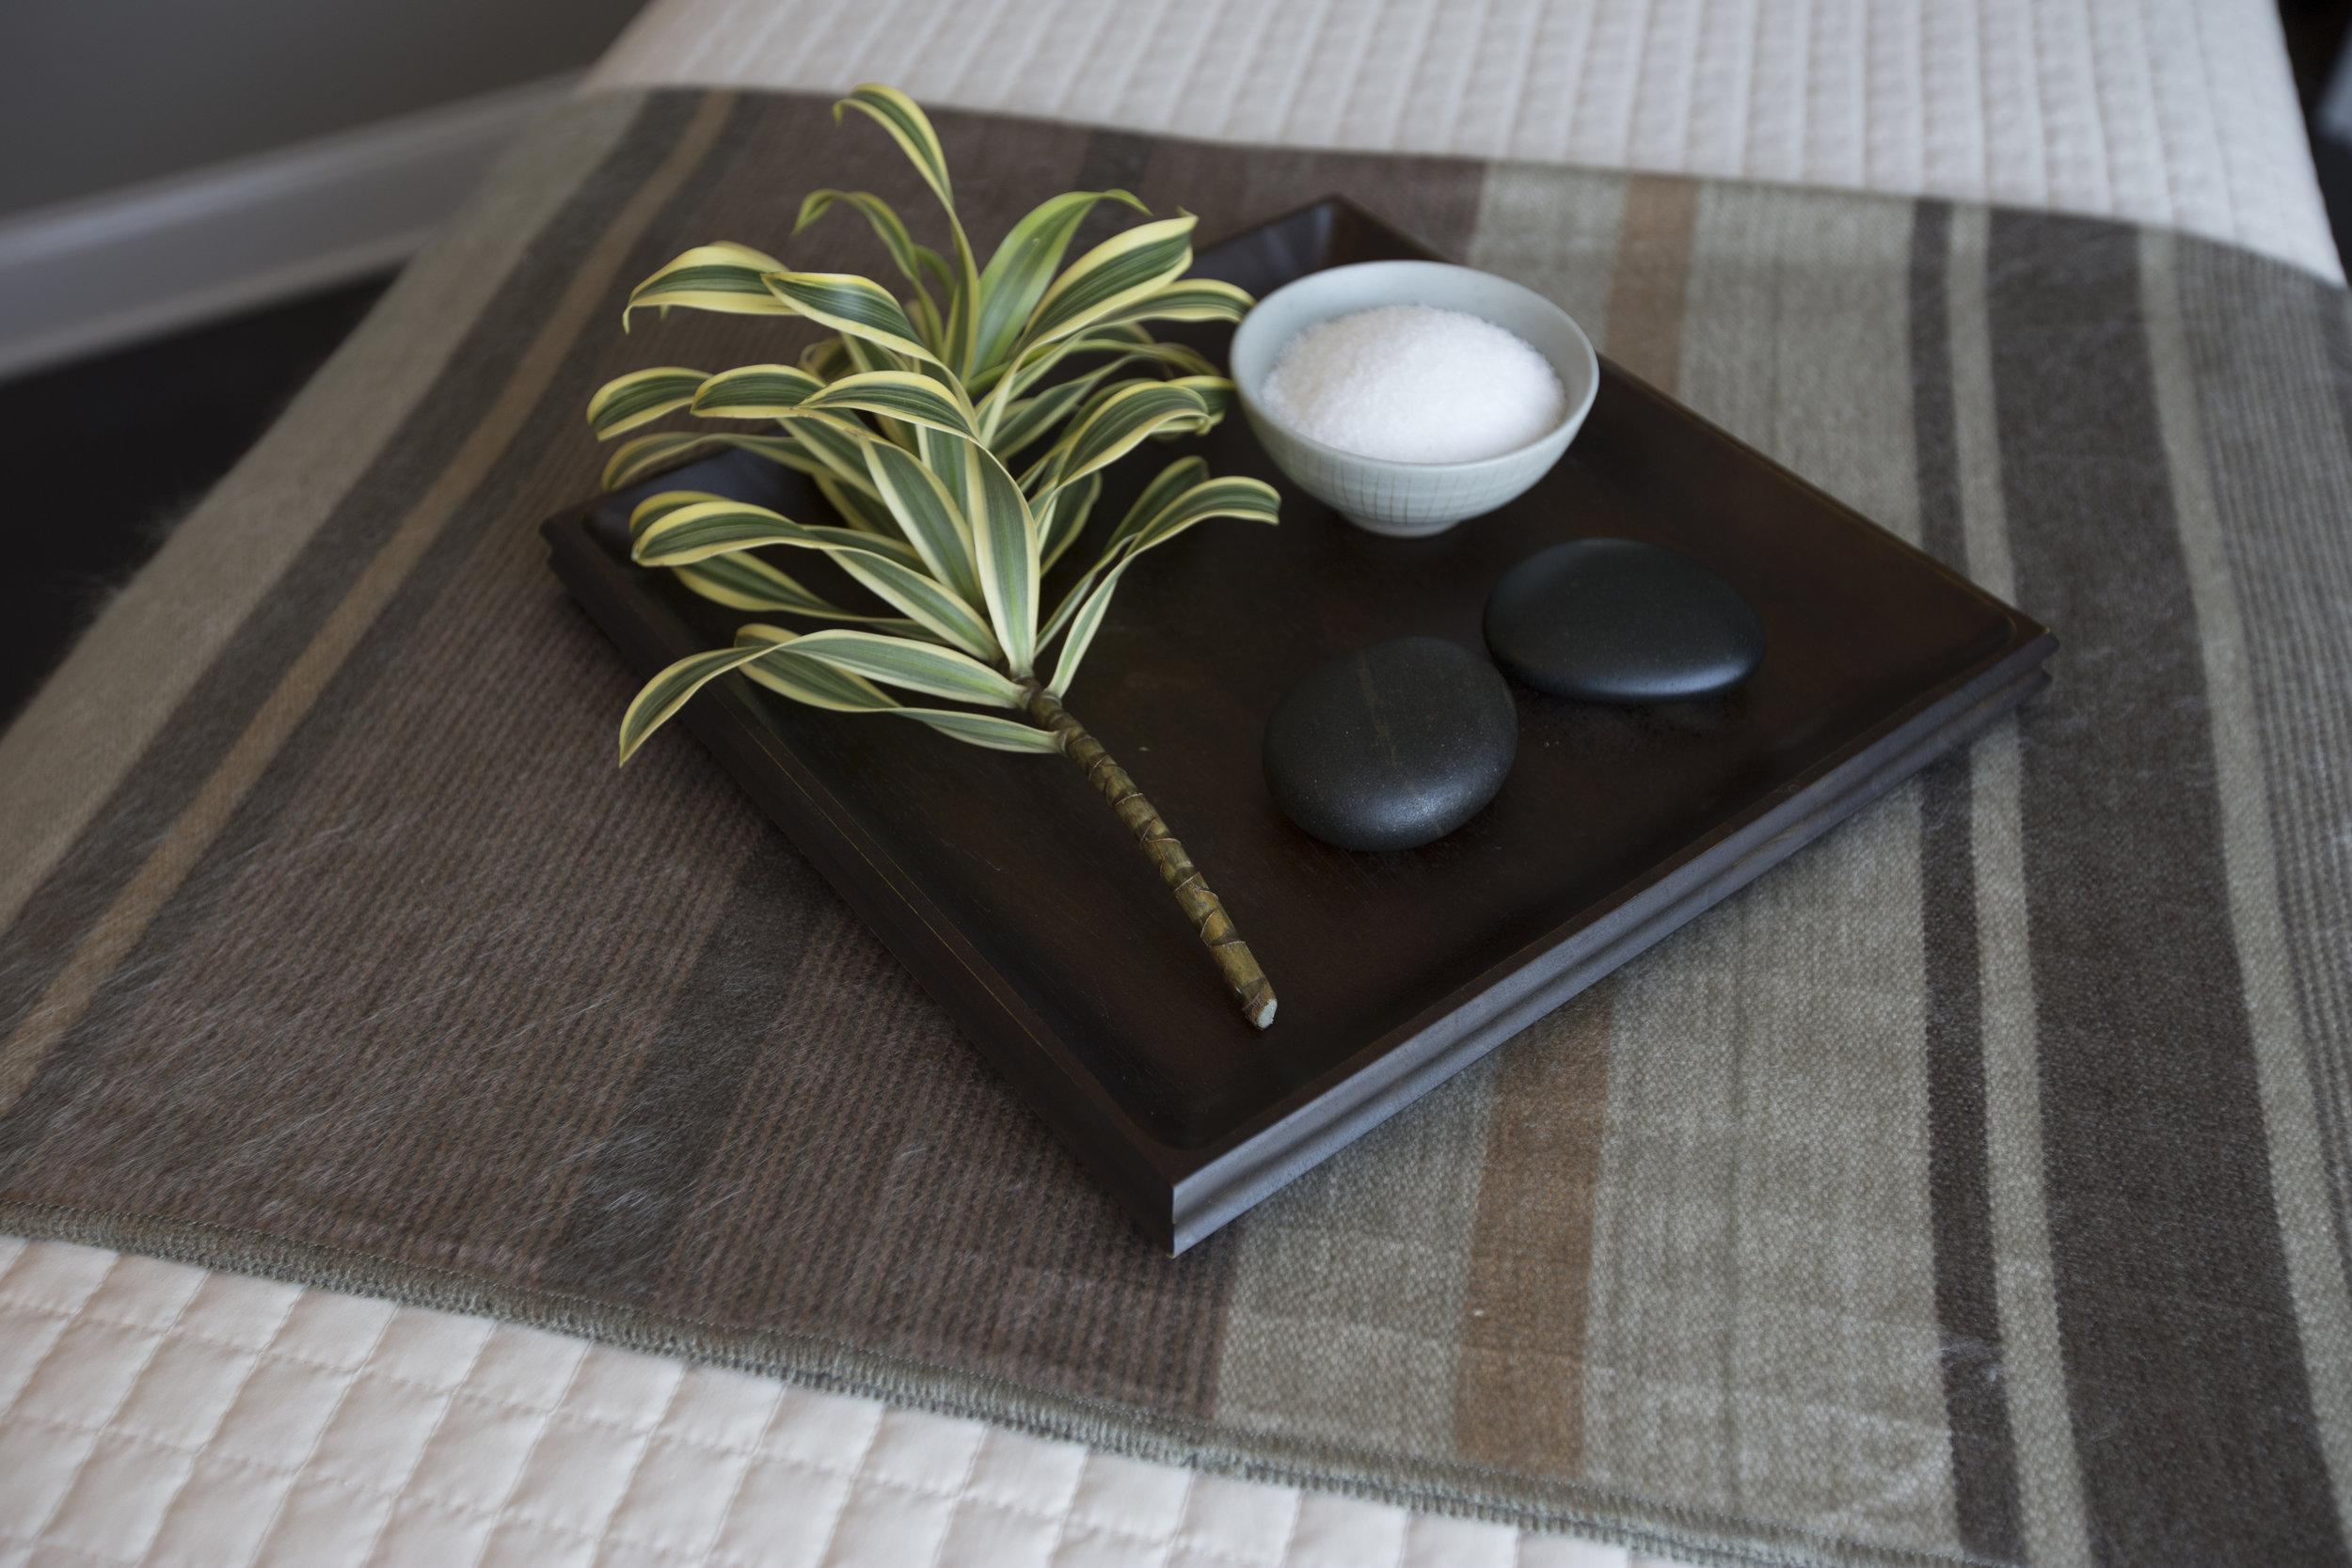 Cary's Luxury Spa - La Therapie